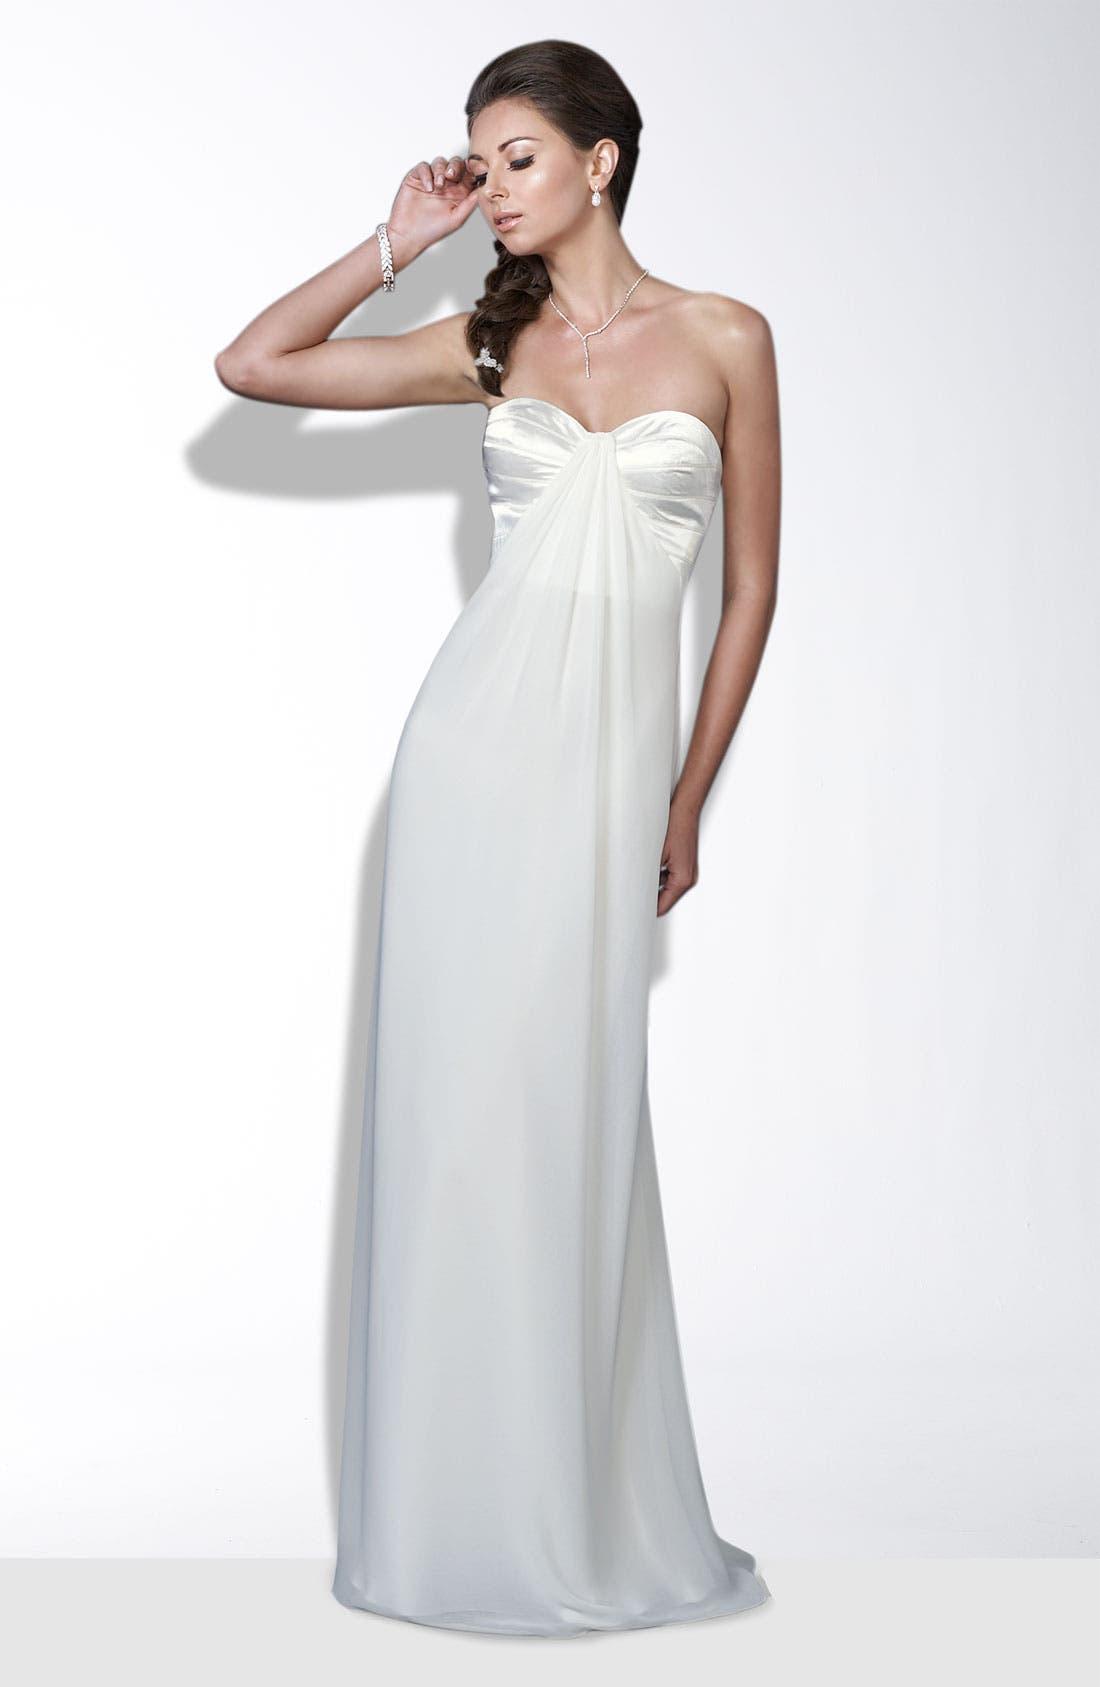 Alternate Image 1 Selected - La Femme Crisscross Back Satin & Chiffon Gown